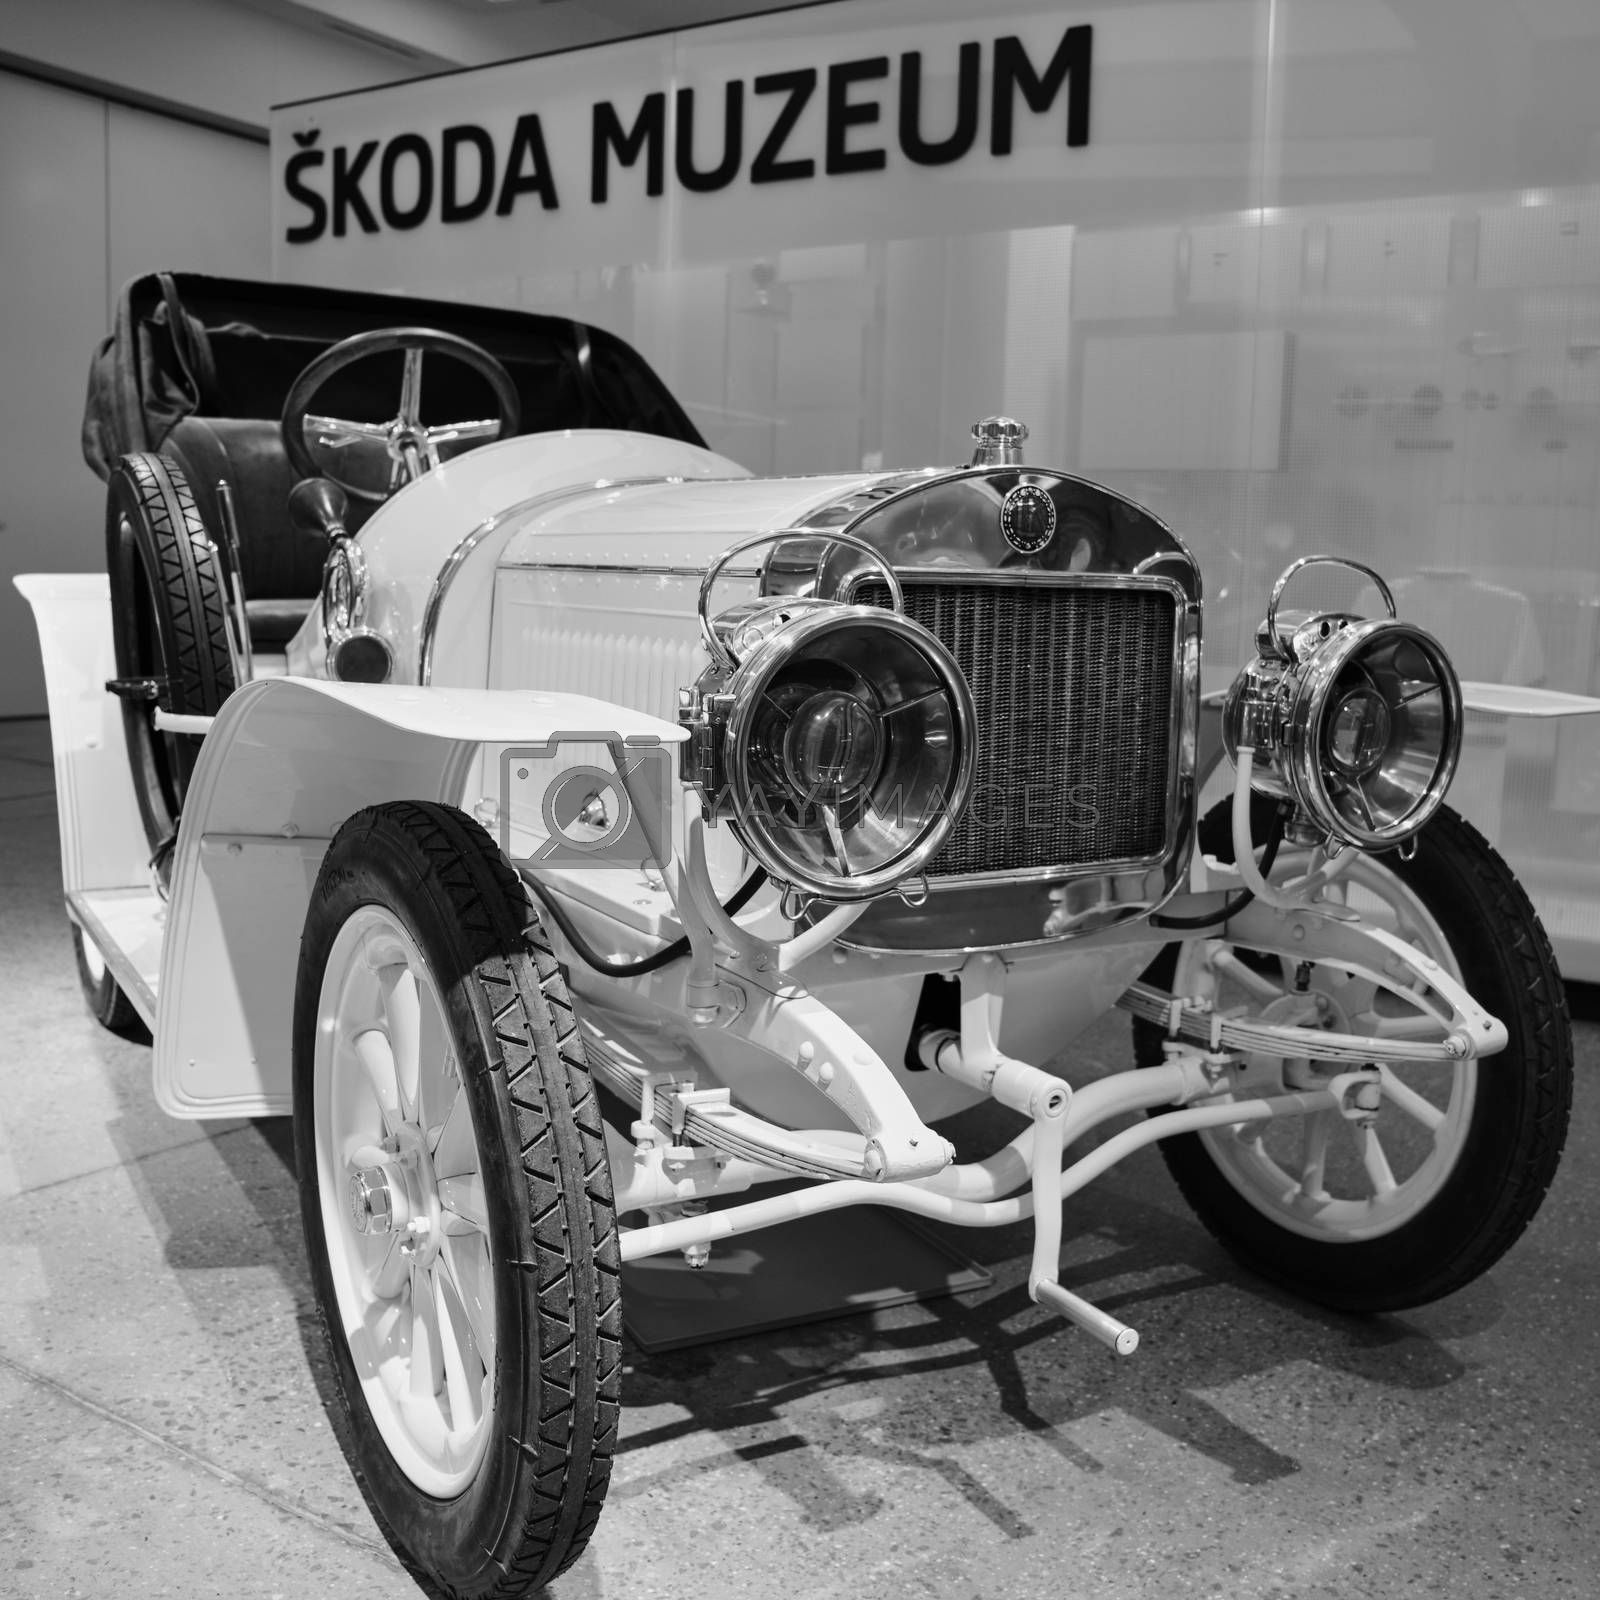 Mlada Boleslav/Czech Republic - January 6, 2019: Skoda Auto Museum, Automobile museum presents the history of the company Skoda and Laurin & Klement